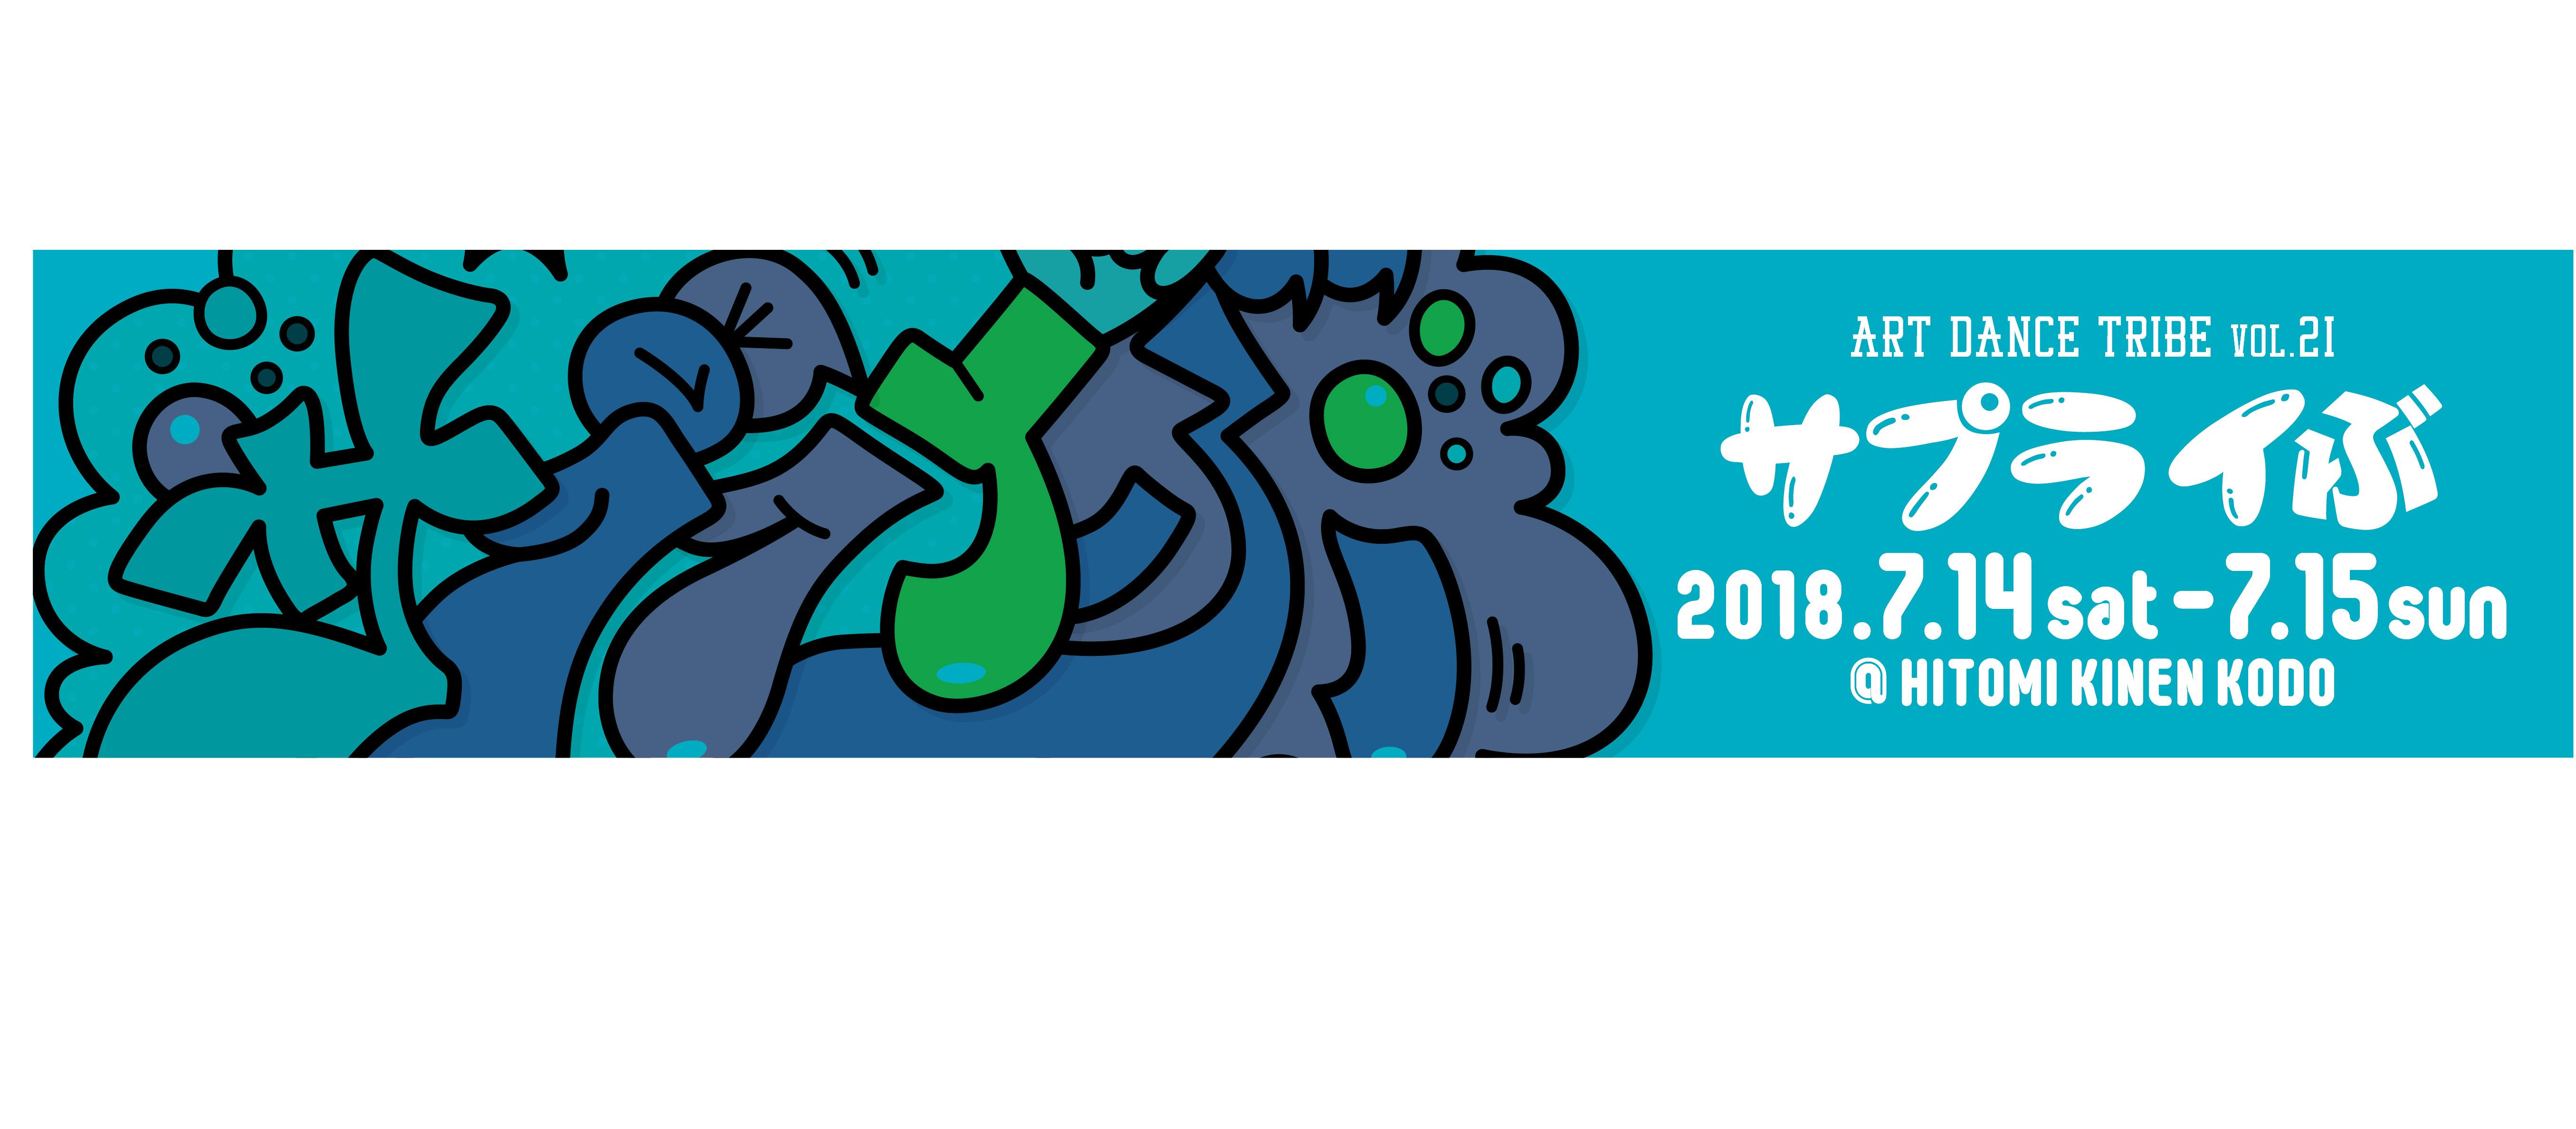 DANCEWORKS 発表会 2018 〜Art dance tribe vol.21~【サプライぶ】